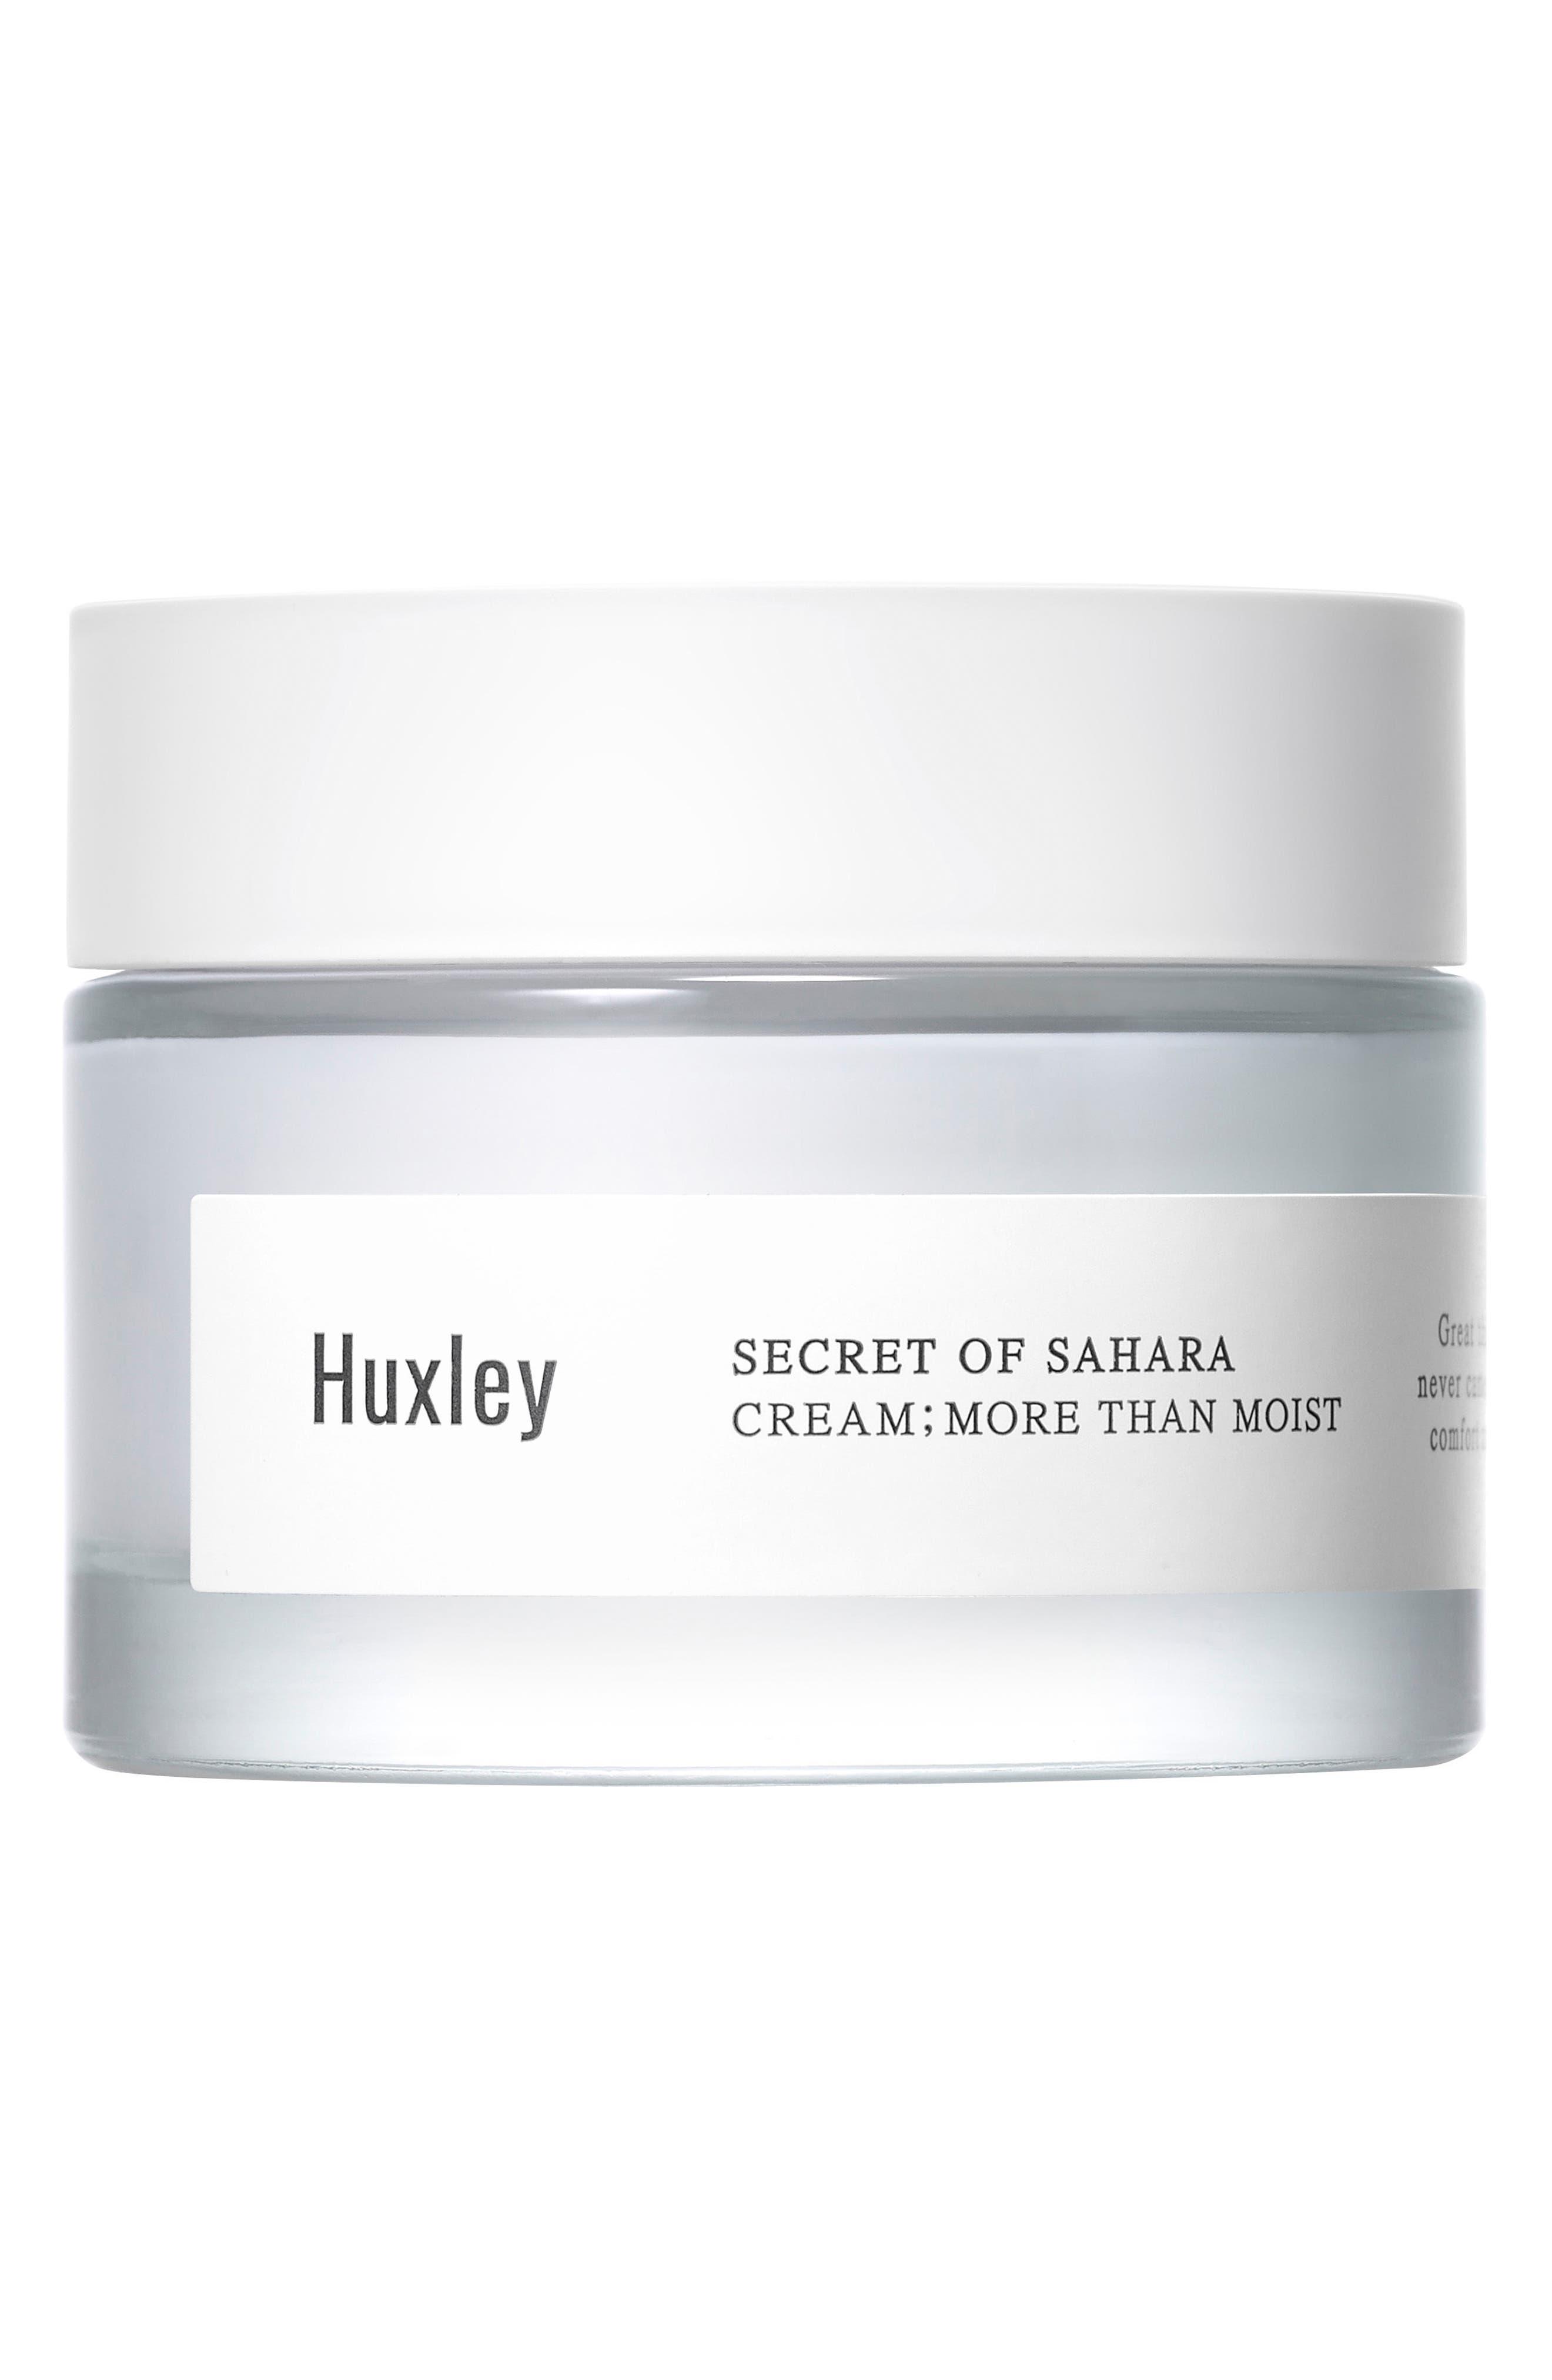 Huxley Secret of Sahara More Than Moist Nourishing Cream